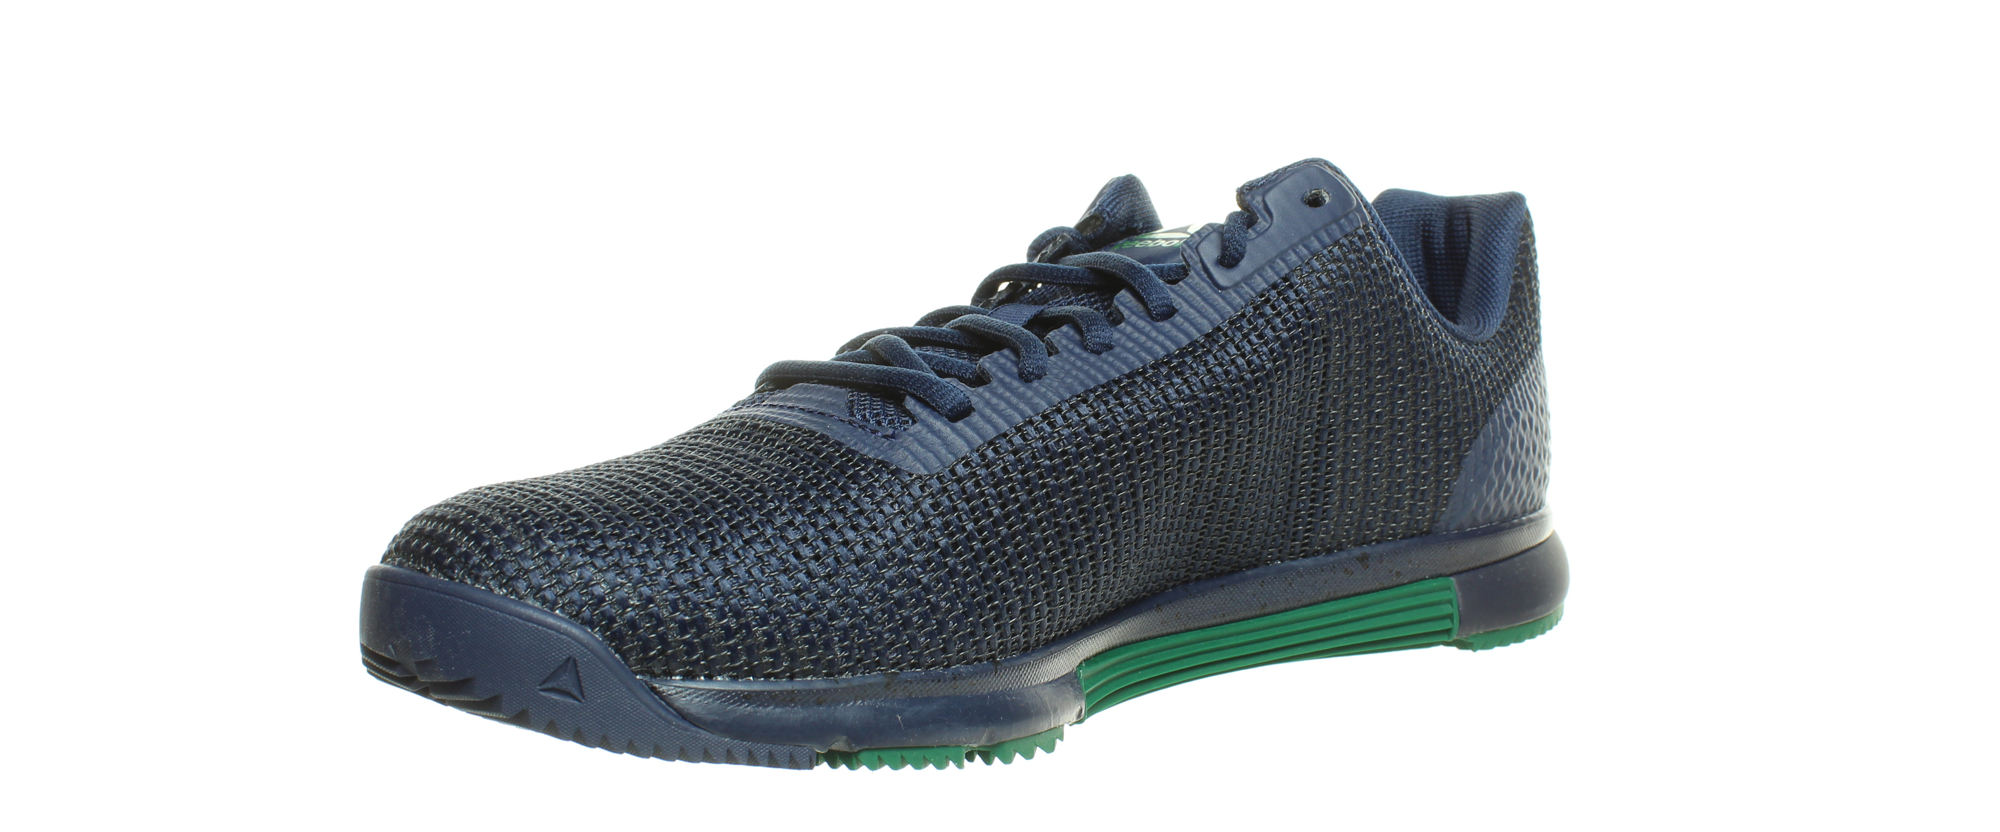 Reebok-Mens-Athletic-Speed-TR-Flexweave-Cross-Training-Shoes thumbnail 15